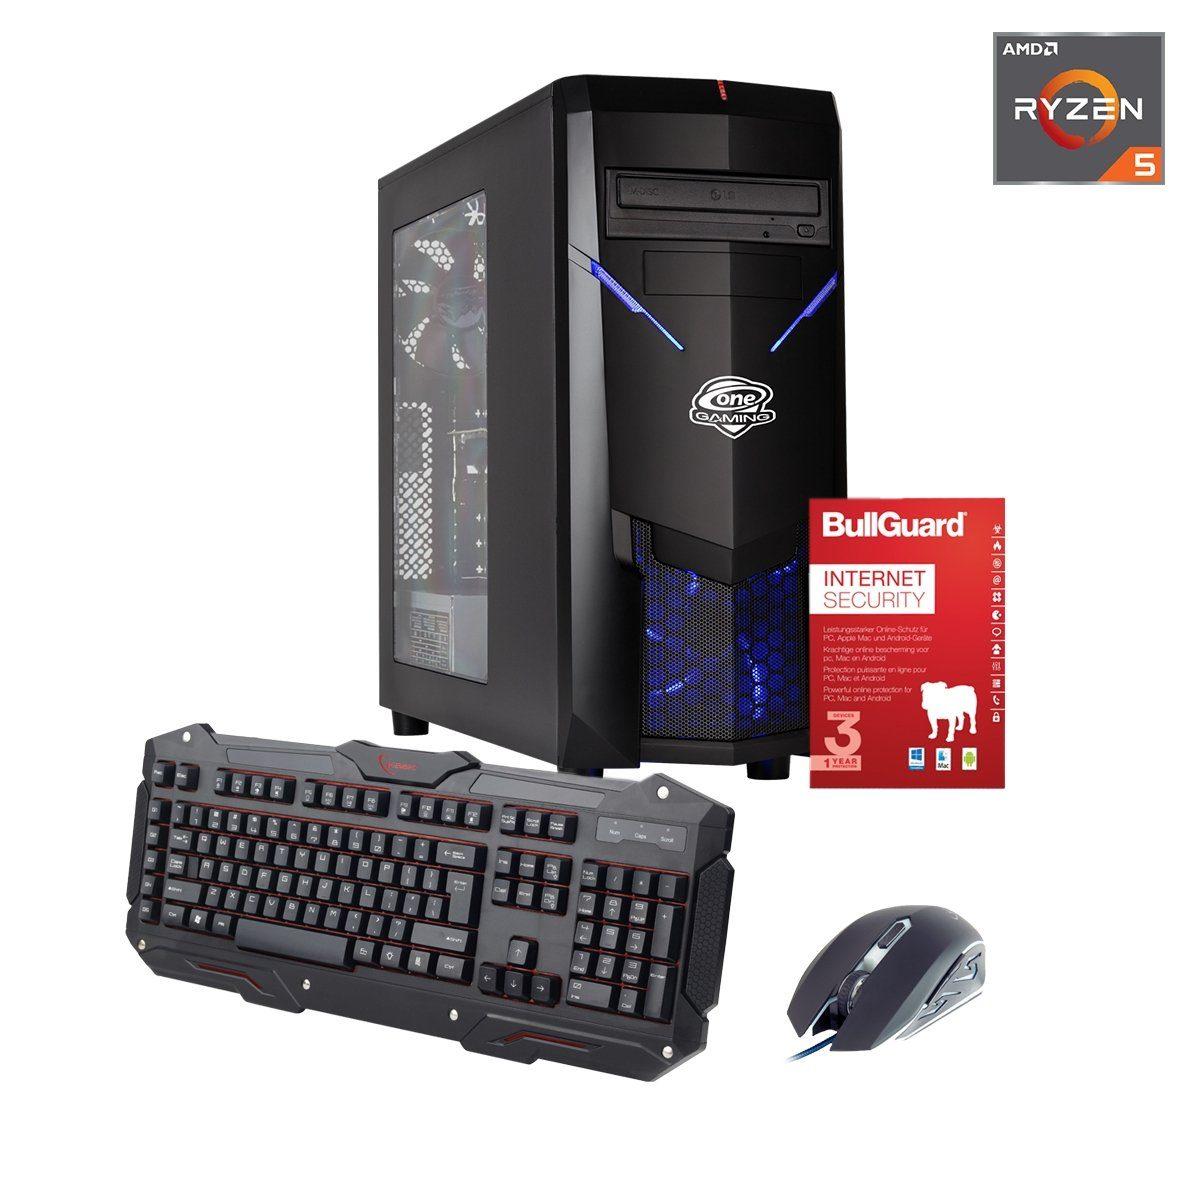 ONE GAMING PC, Ryzen 5 2400G, Radeon RX Vega 11 Graphics, 8GB DDR4 RAM »PC 44677«